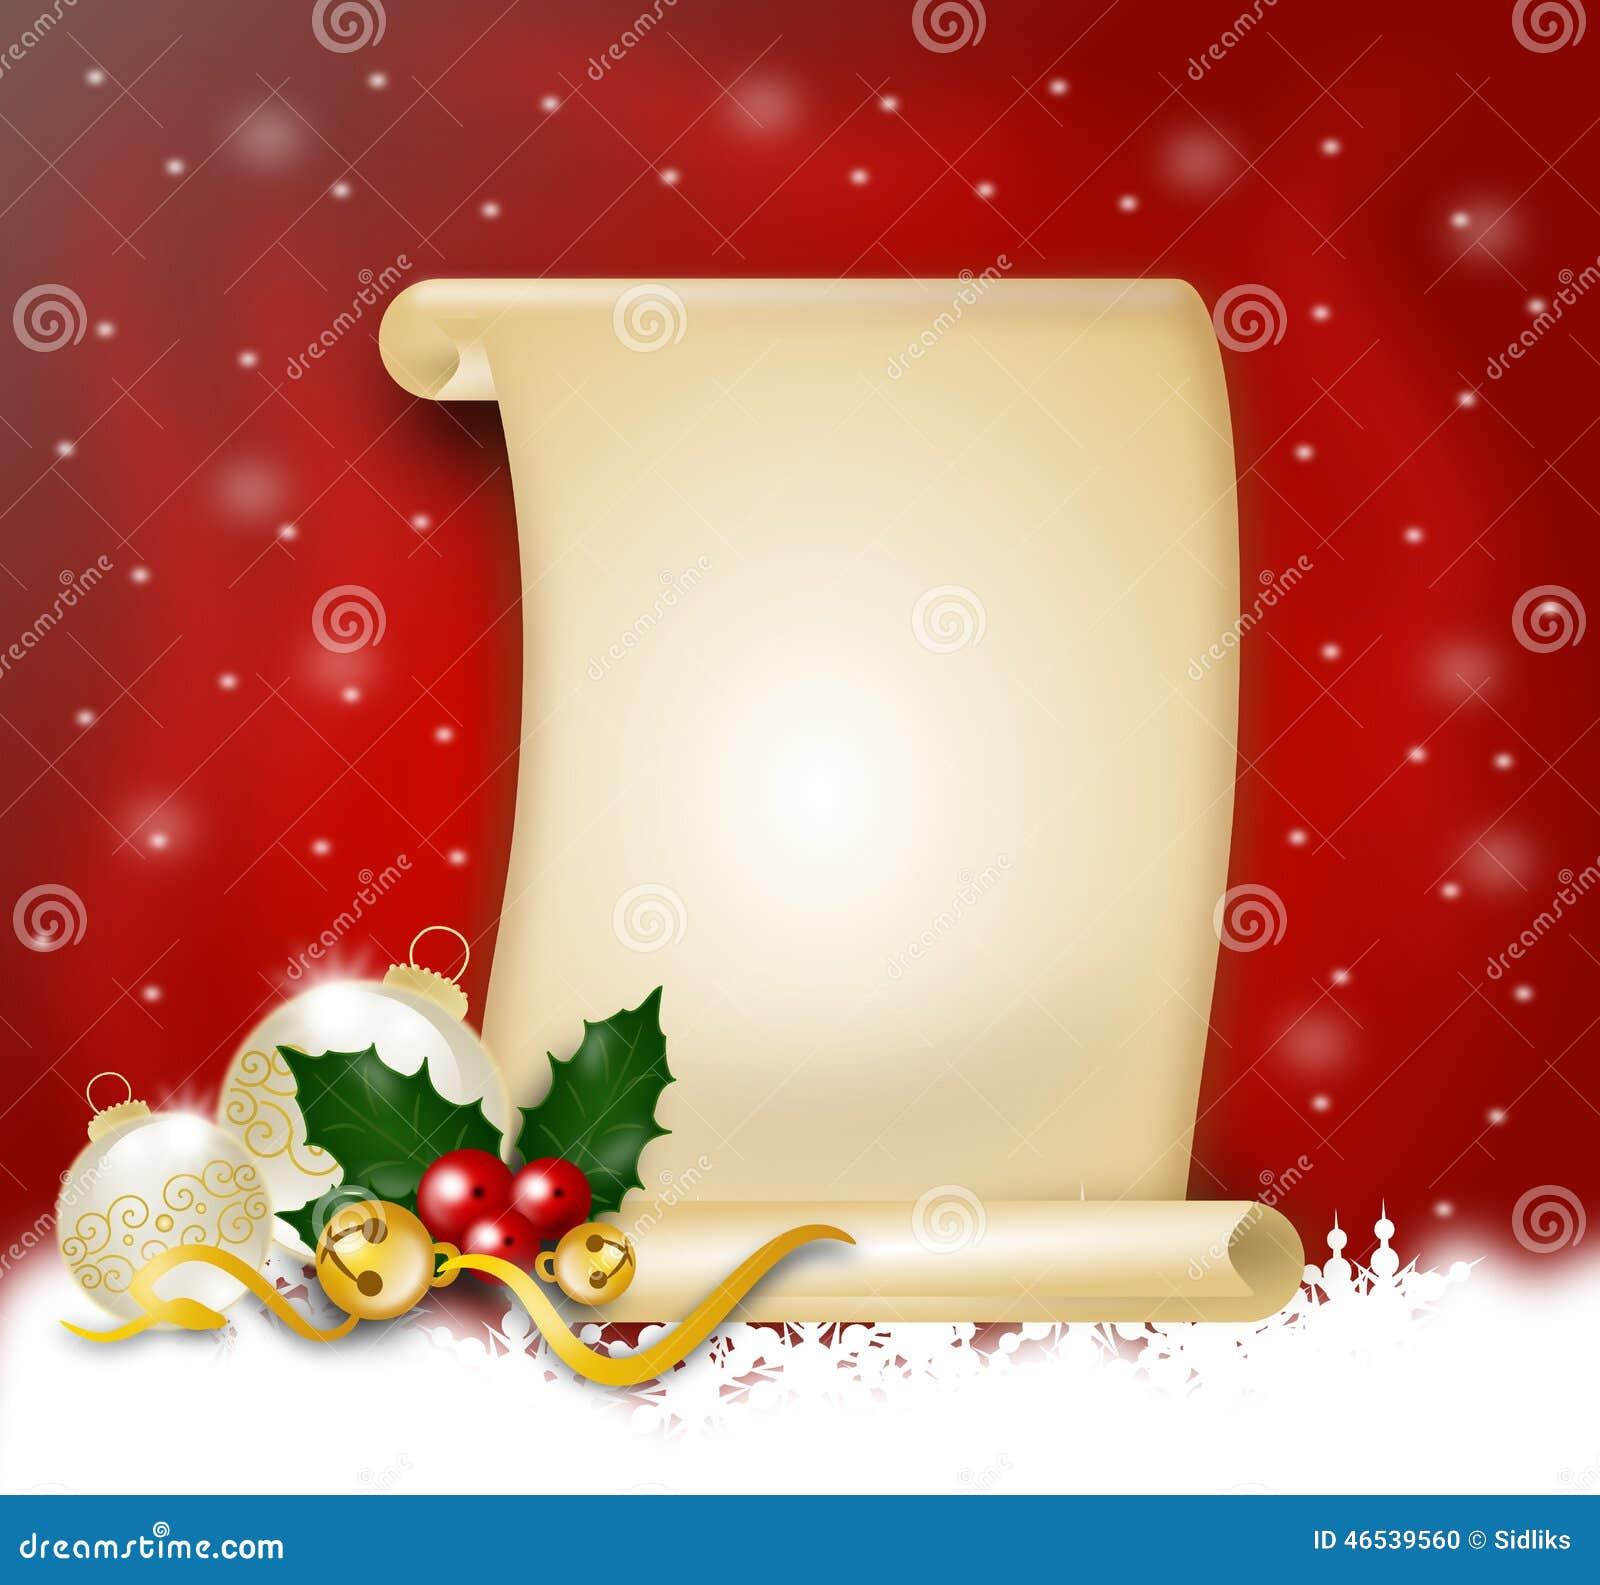 Christmas Wish List Stock Illustration Image 46539560